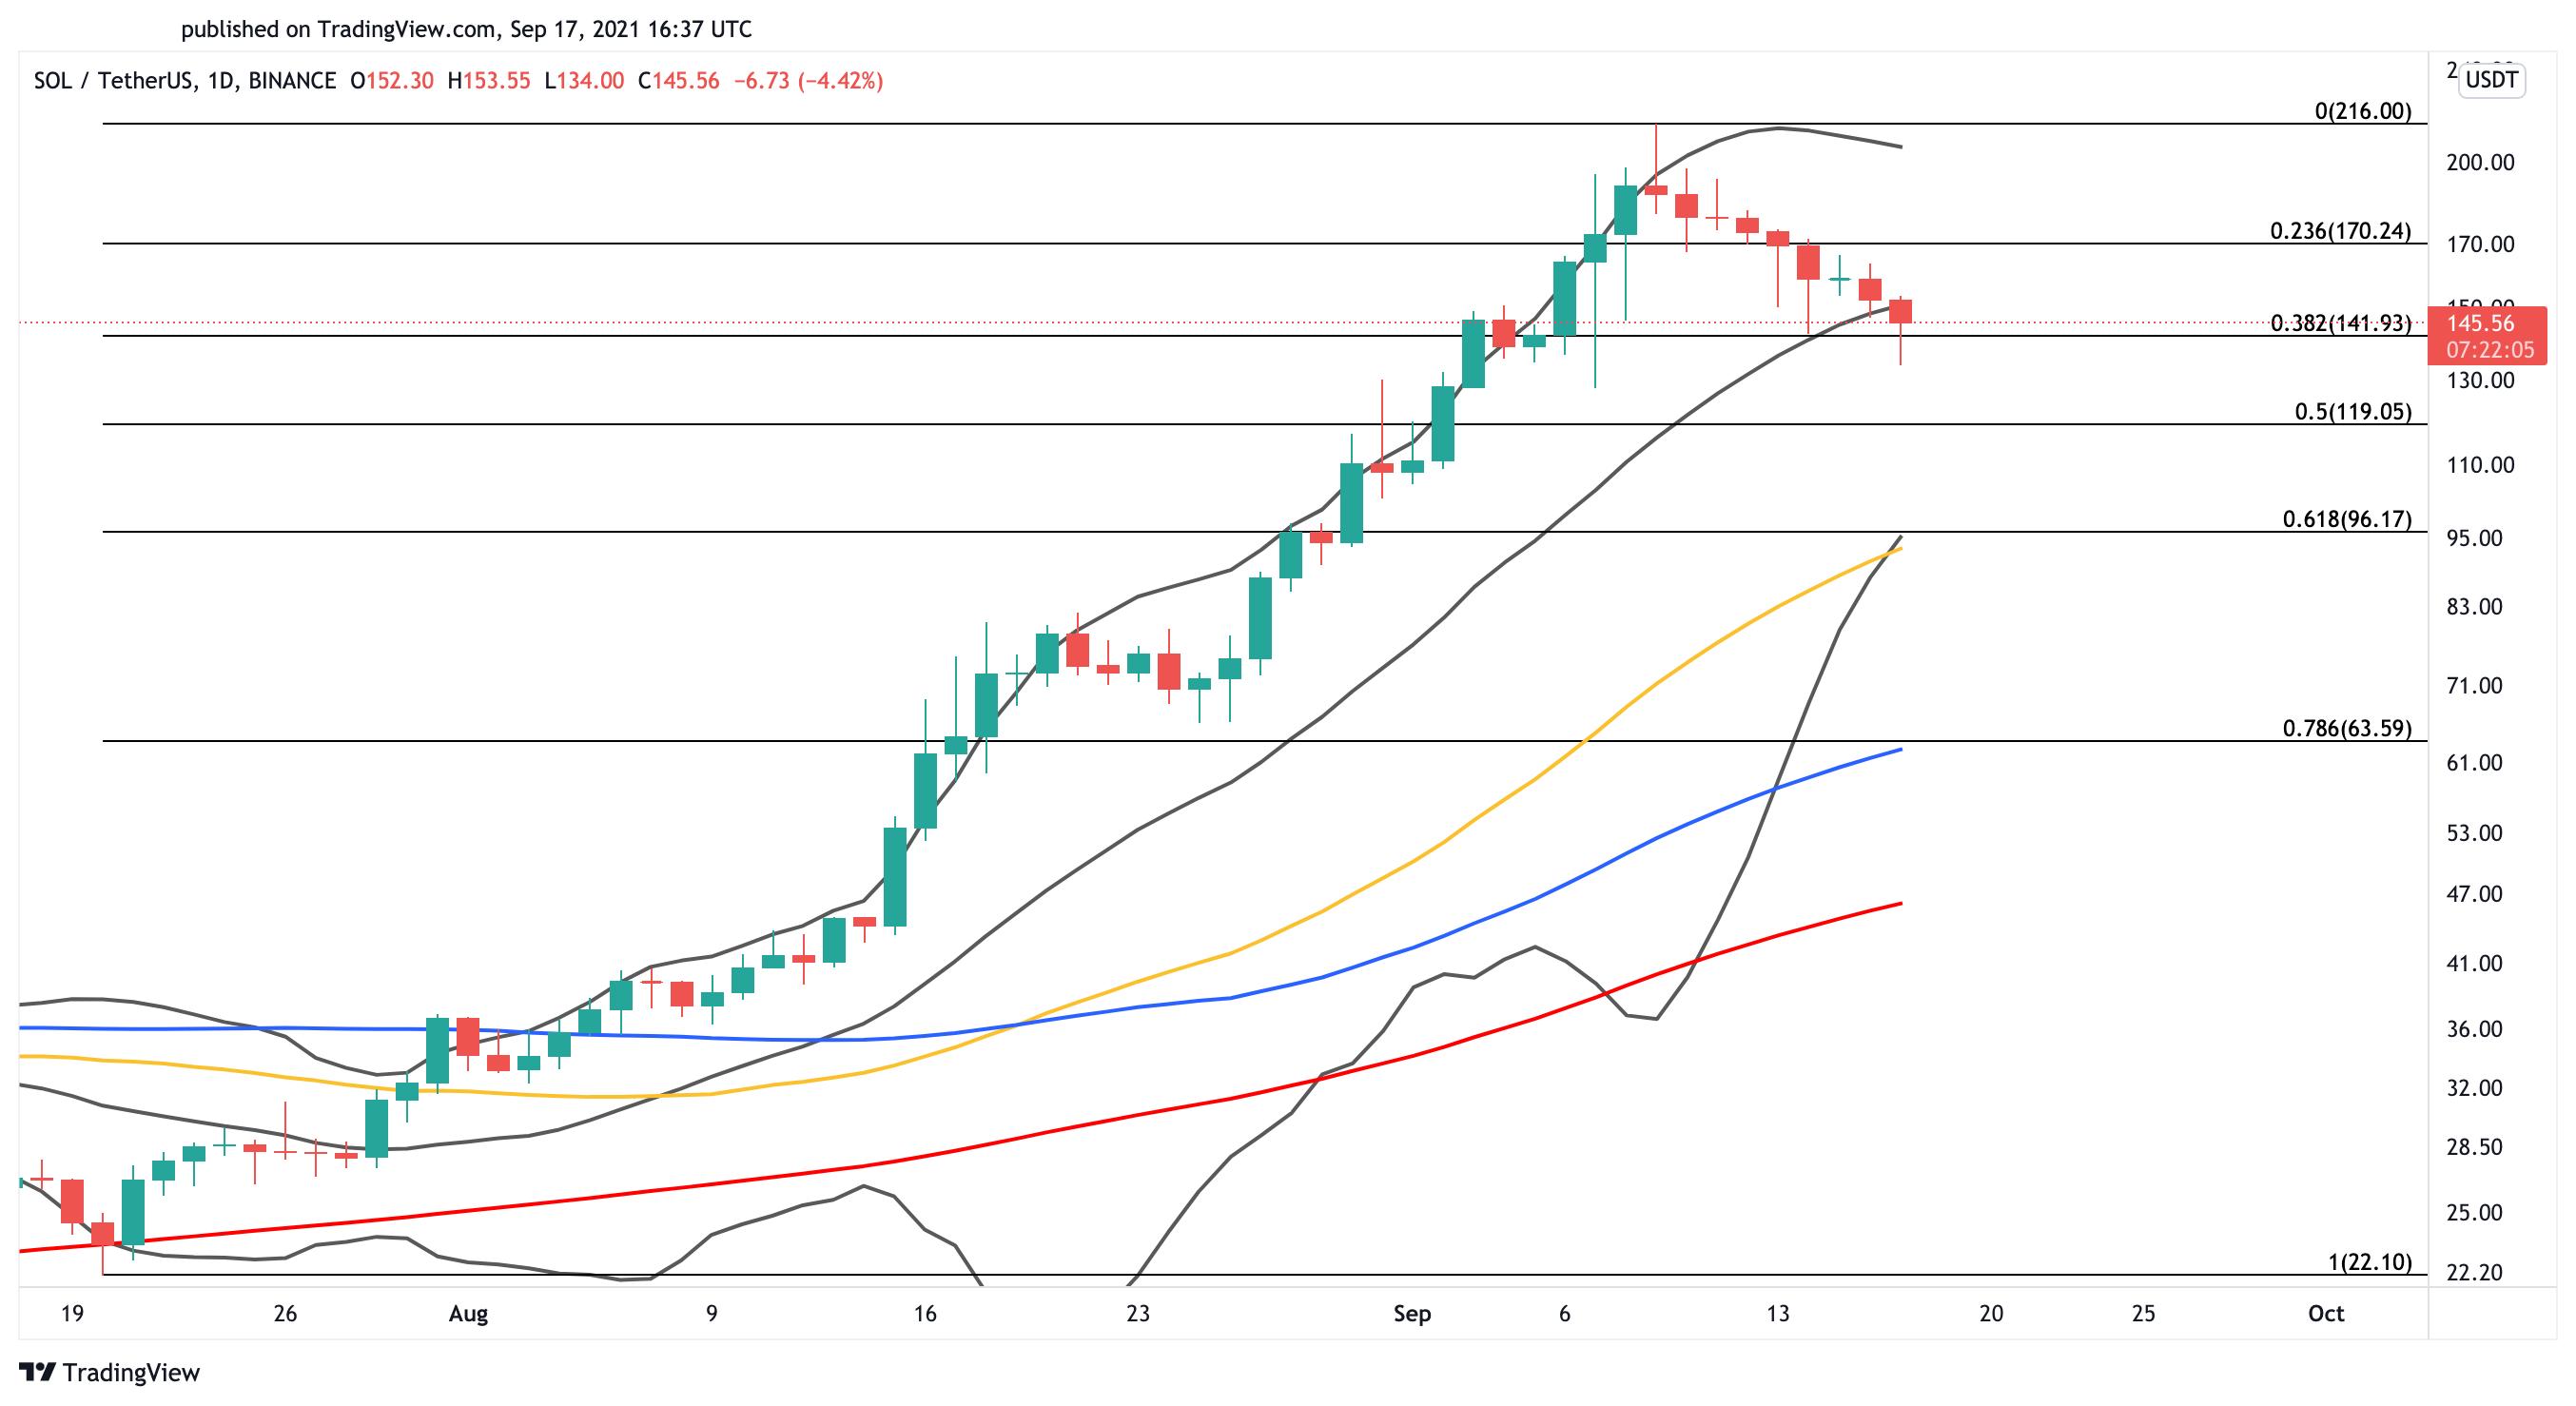 Solana US dollar price chart